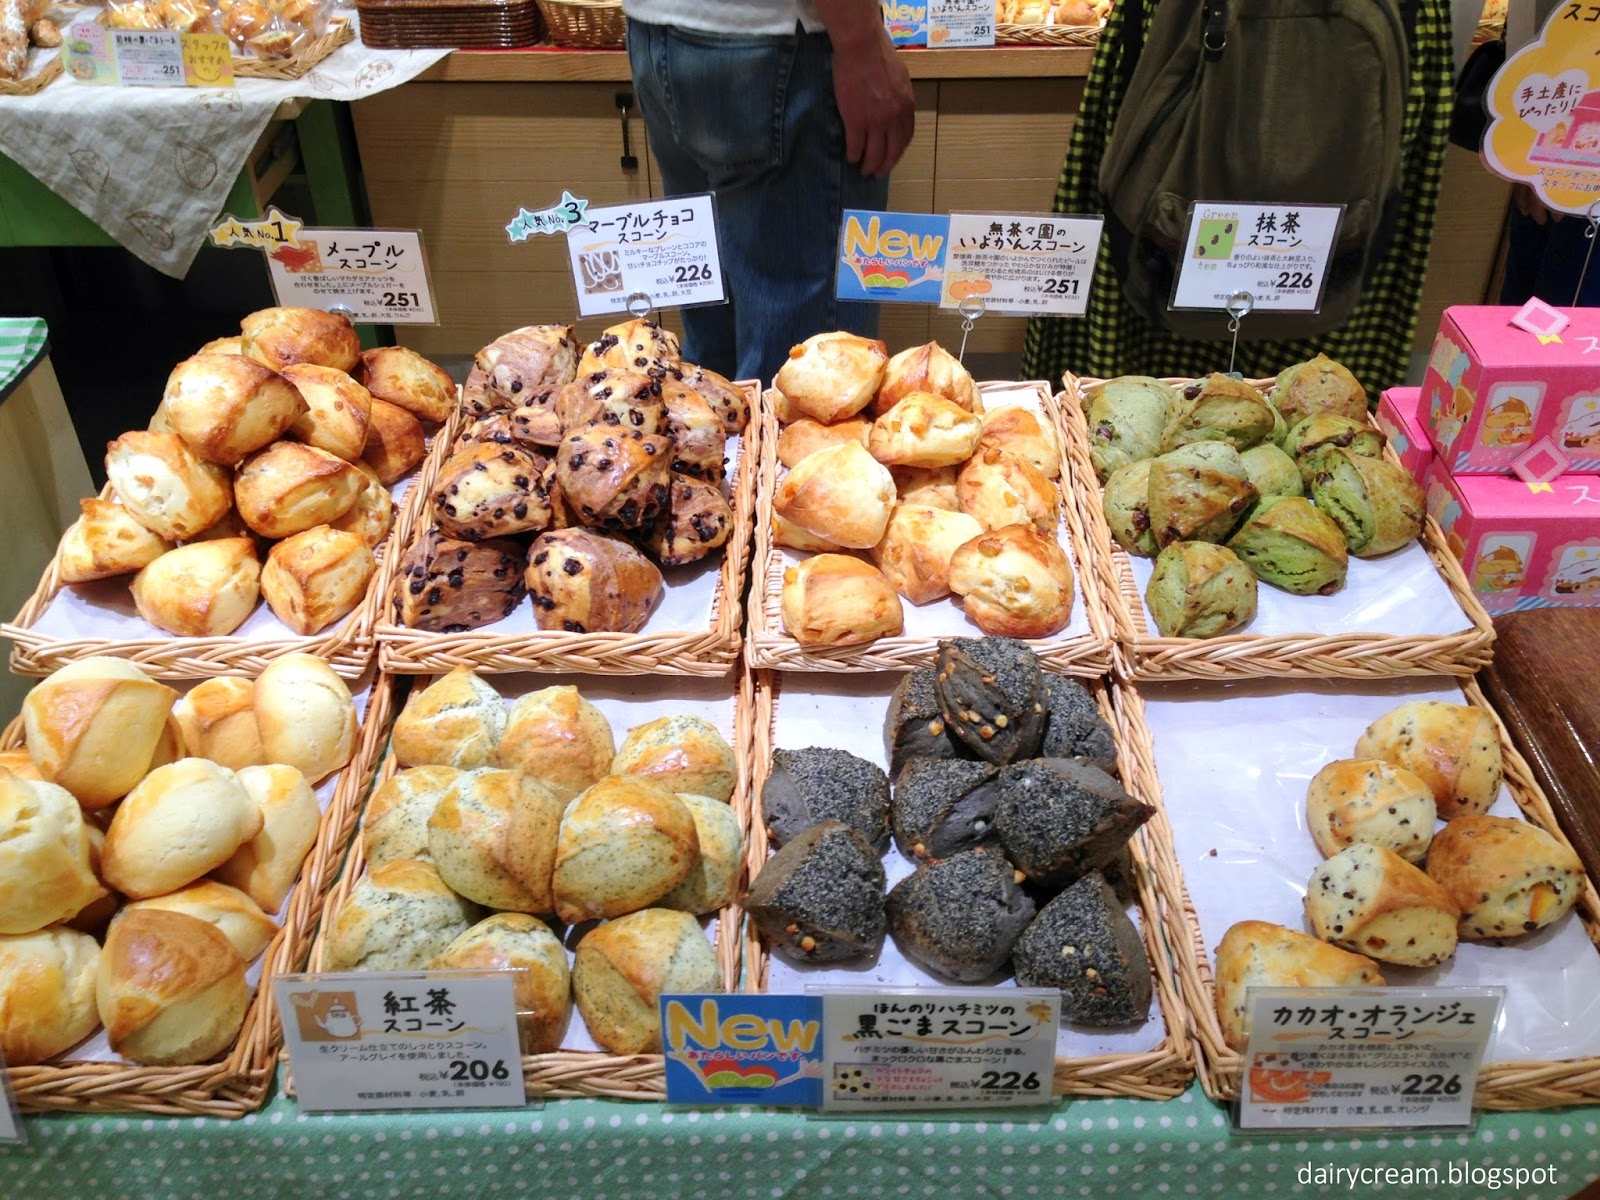 Singapore Japan Food Blog : Dairy and Cream: La Boulangerie Quignon Shibuya キィニョン : Full-Cream